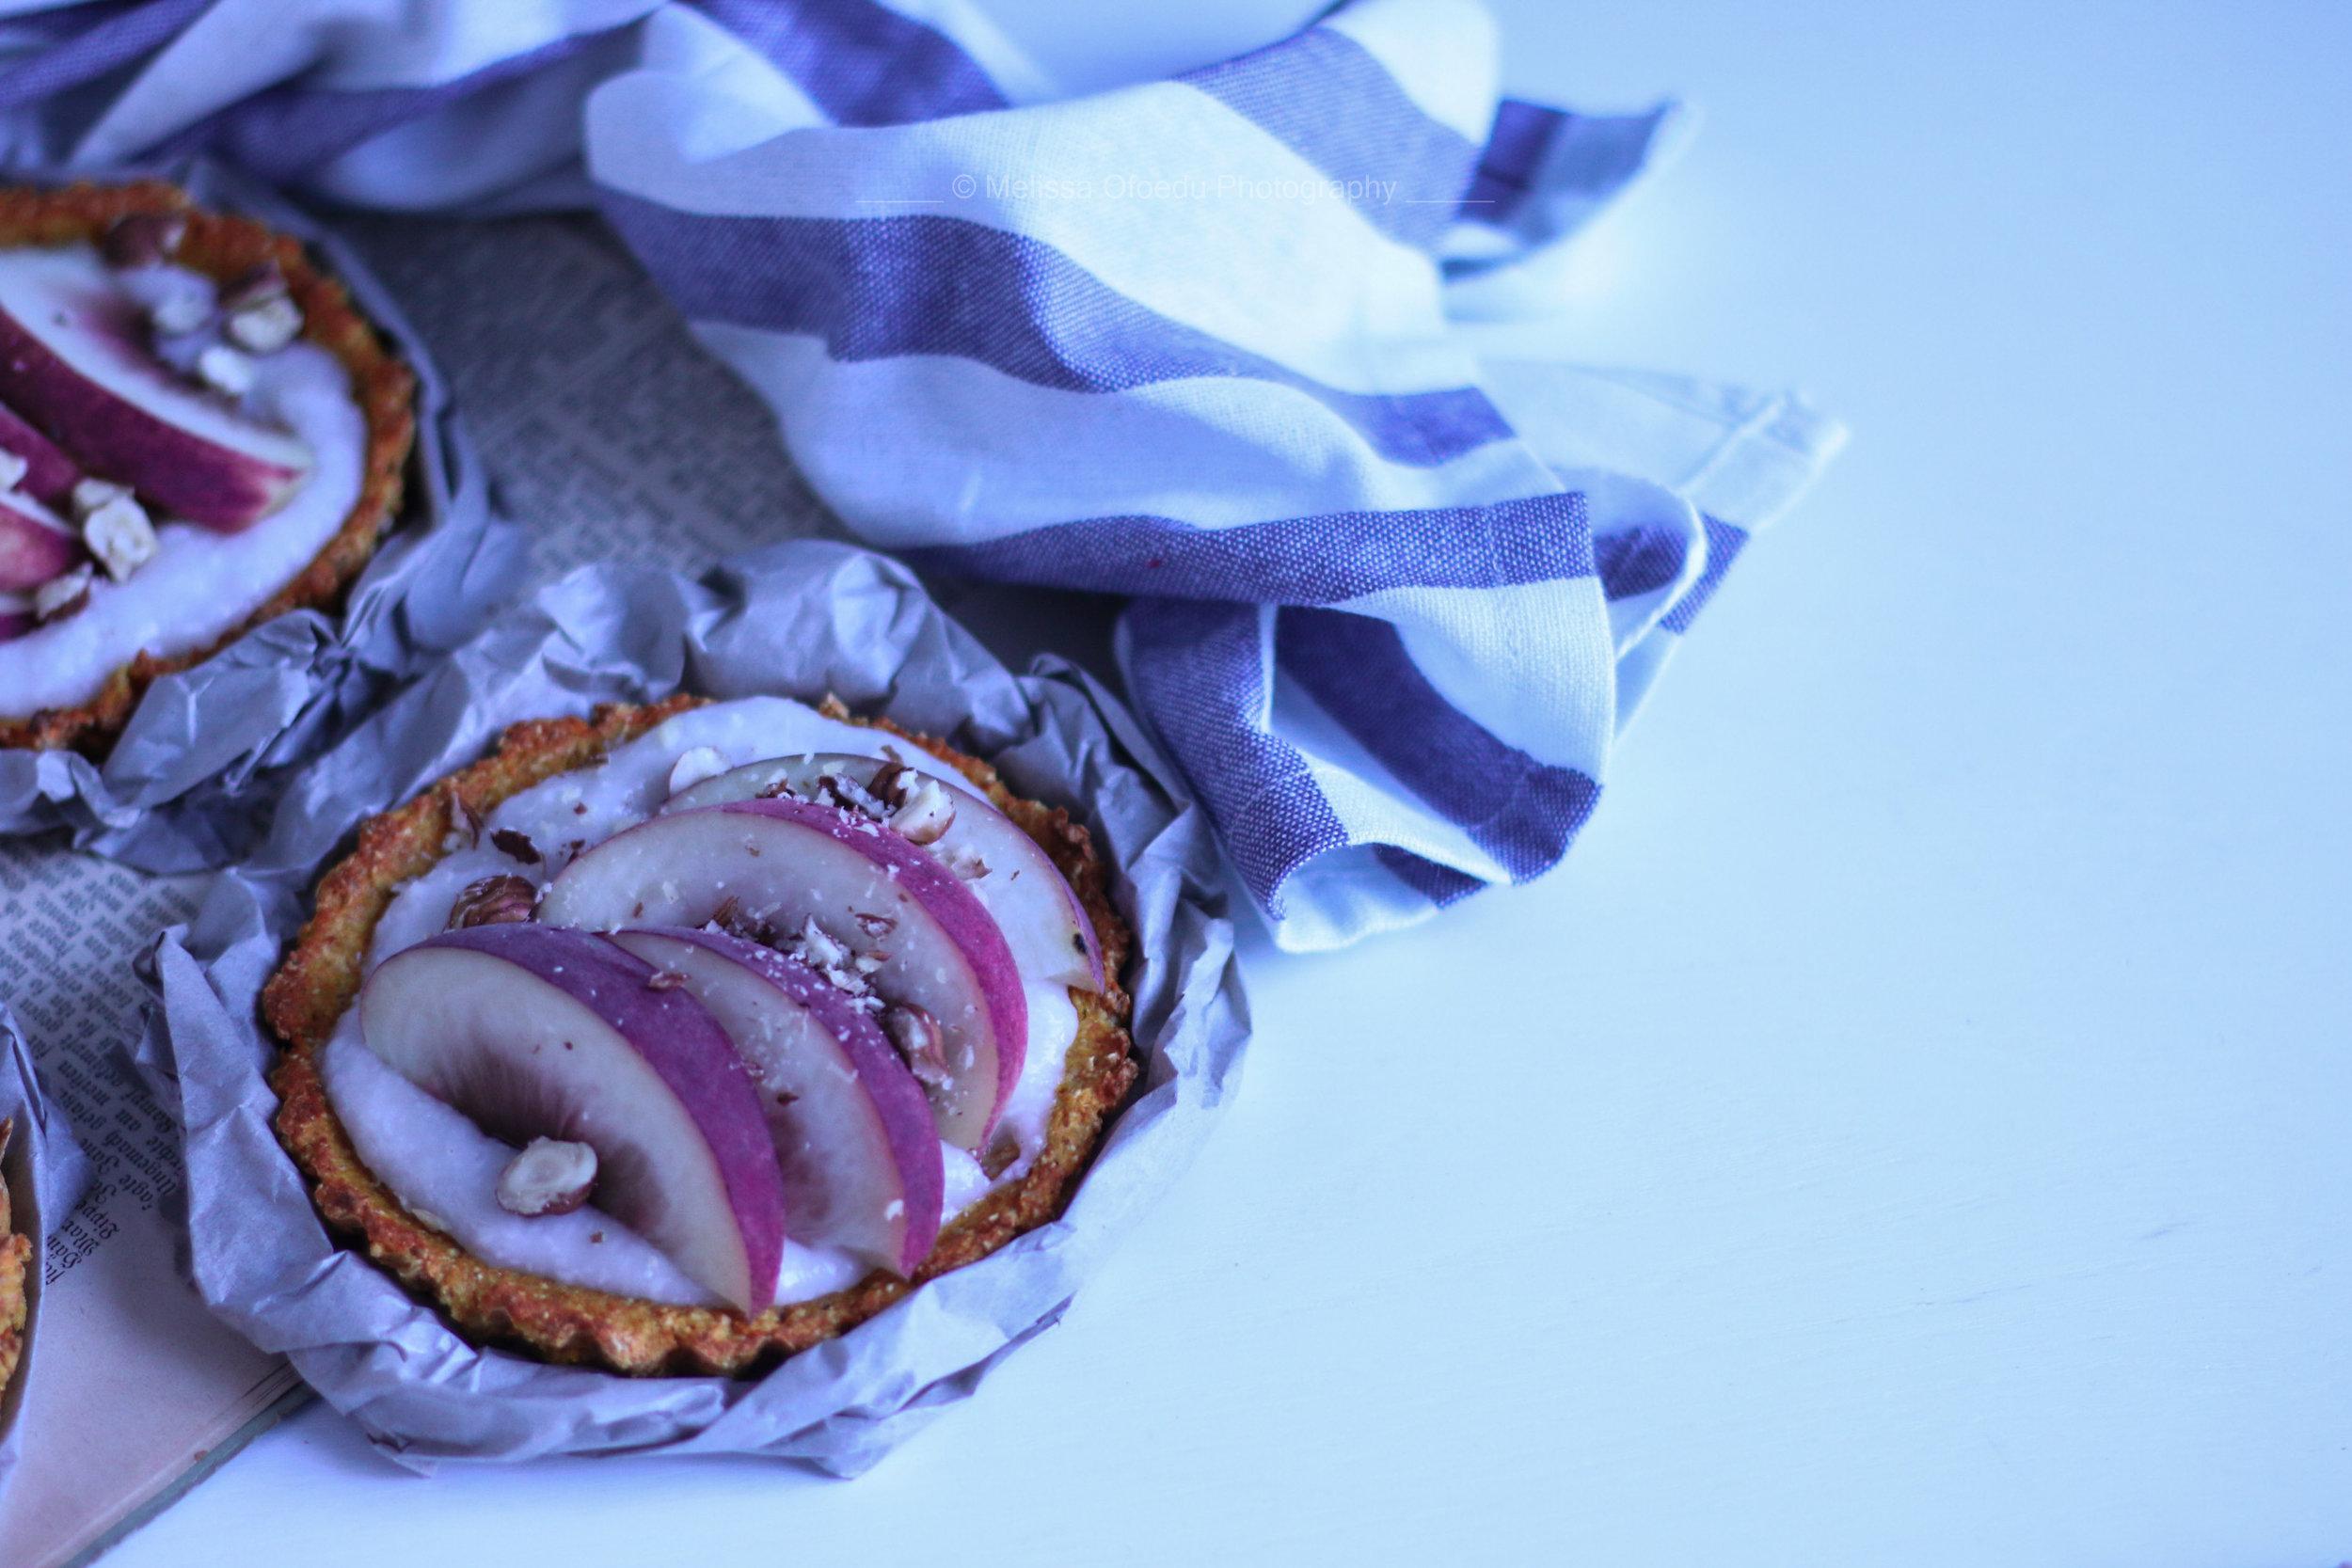 sweetpotatotarte-melissa-ofoedu-photography-for-a-sweet-point-of-view-6-von-1